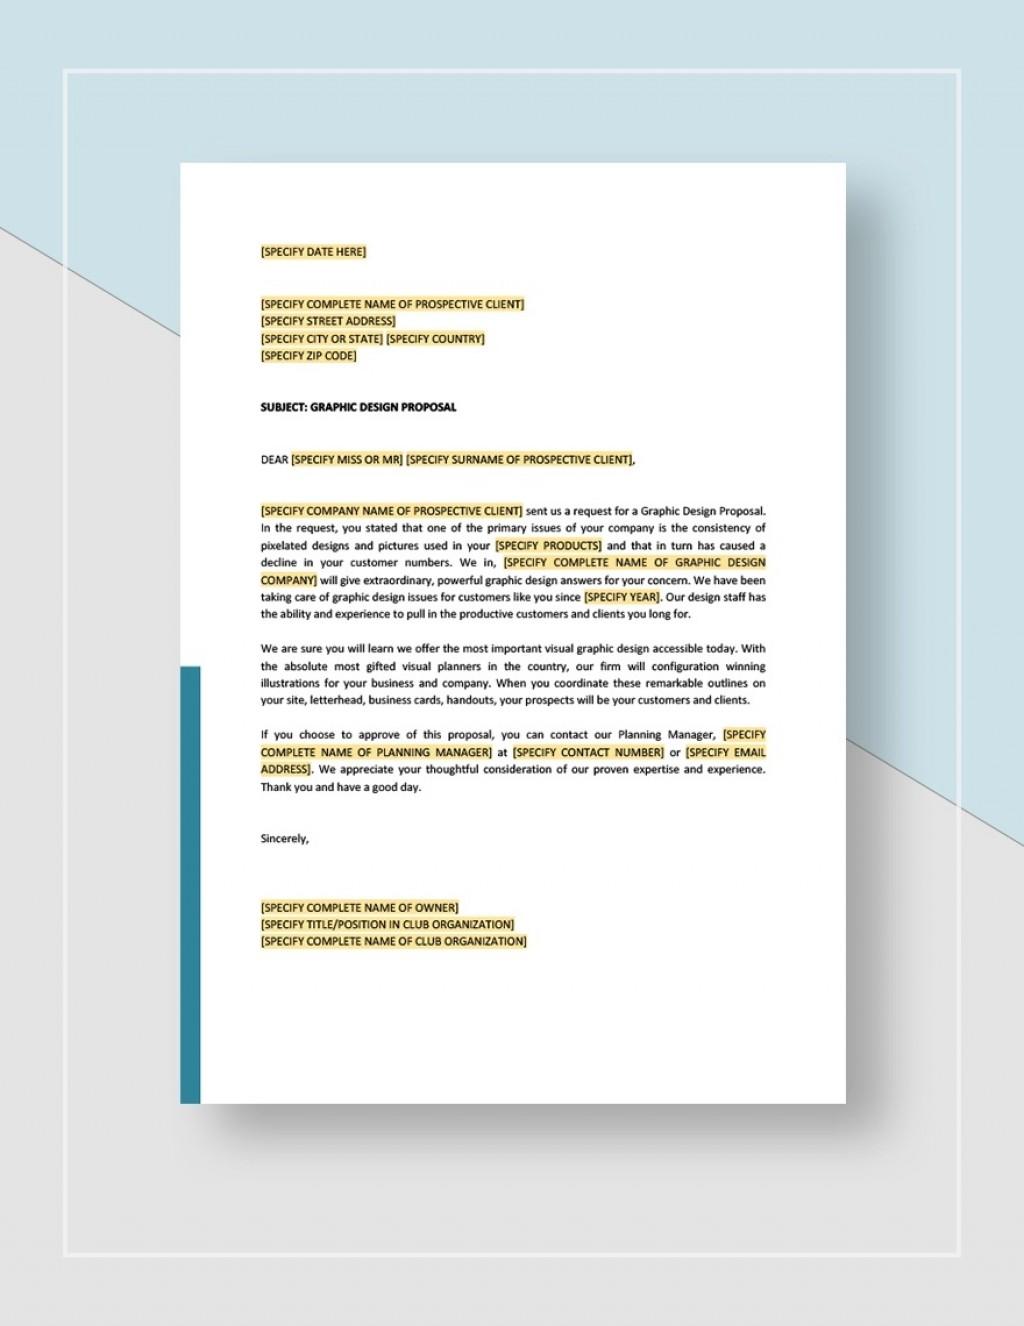 Graphic Design Proposal Template Sample Idea Jpg  Pdf Doc WordLarge